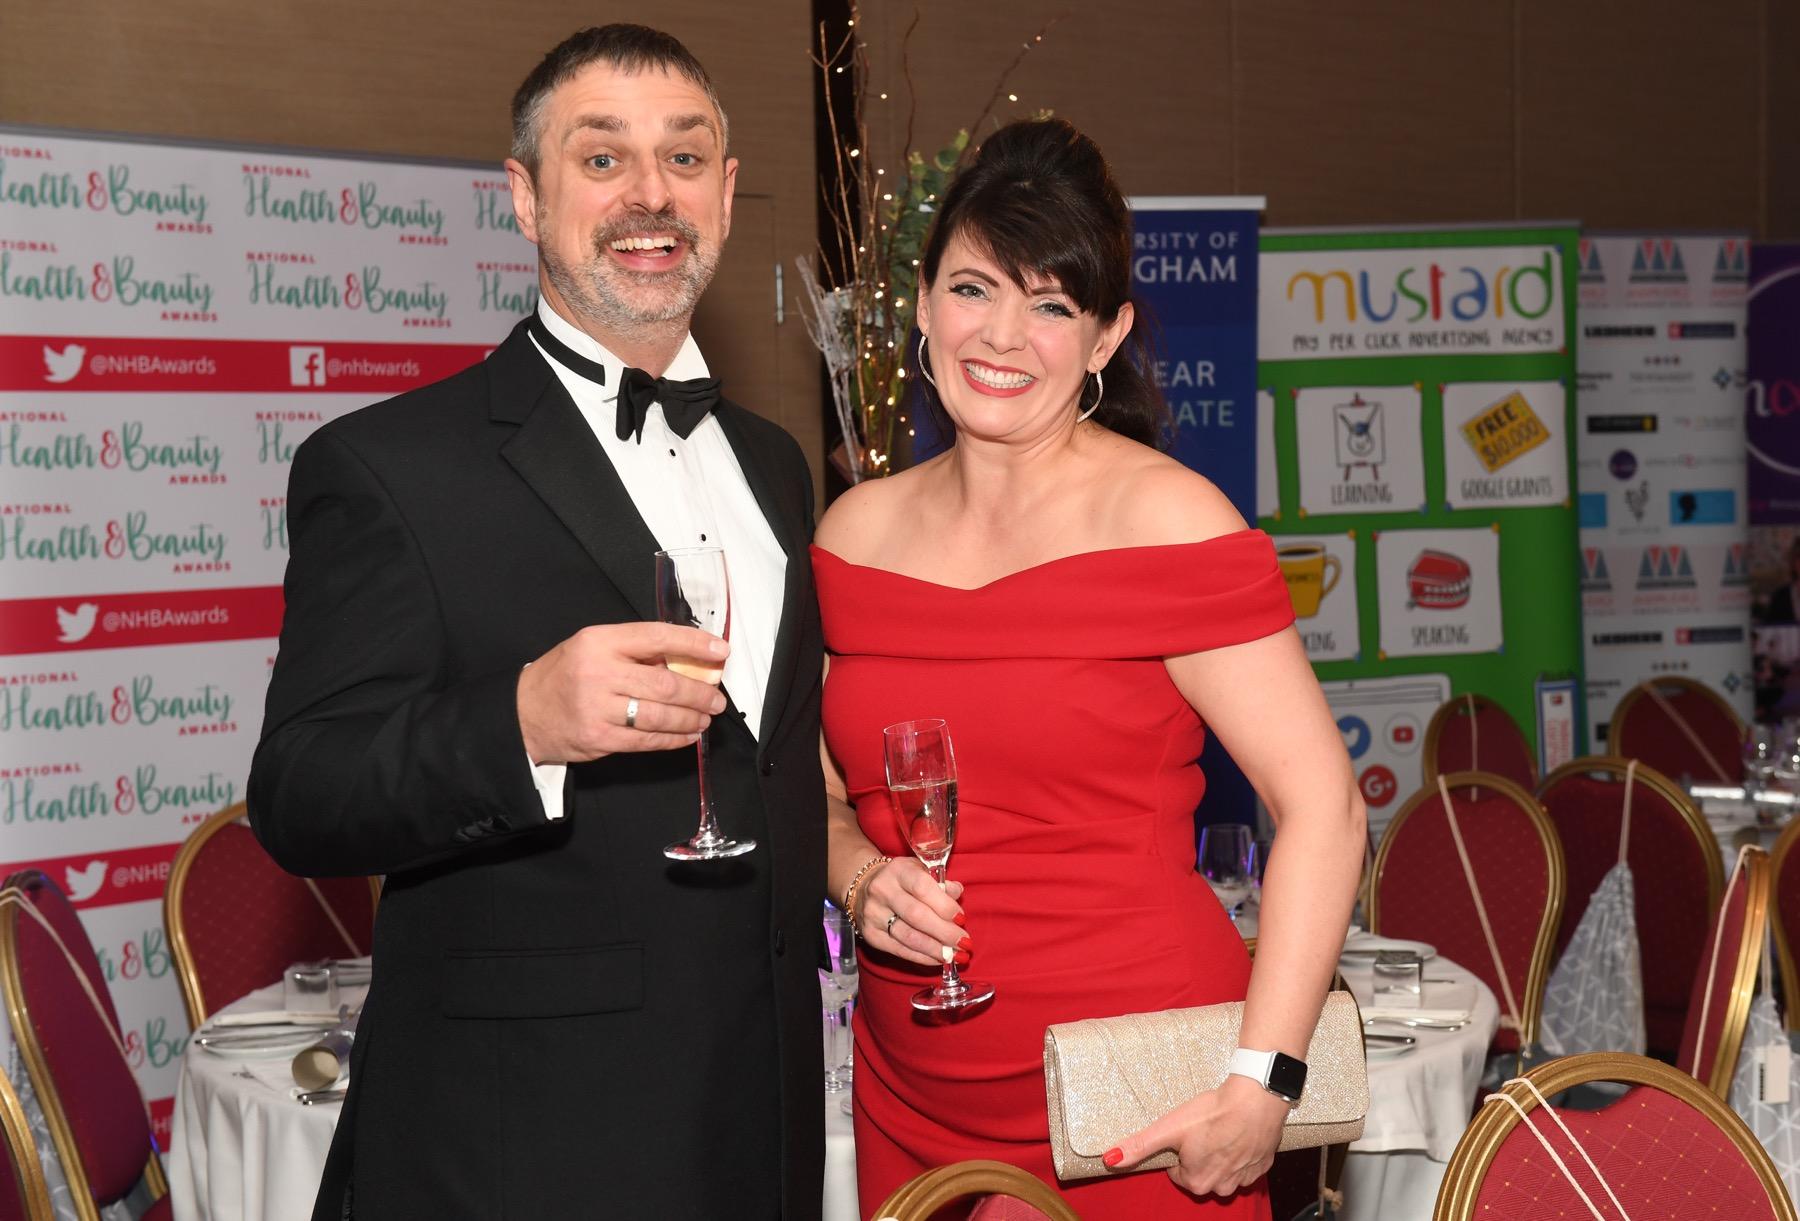 Stuart Burlton and Sam Burlton at the awards dinner